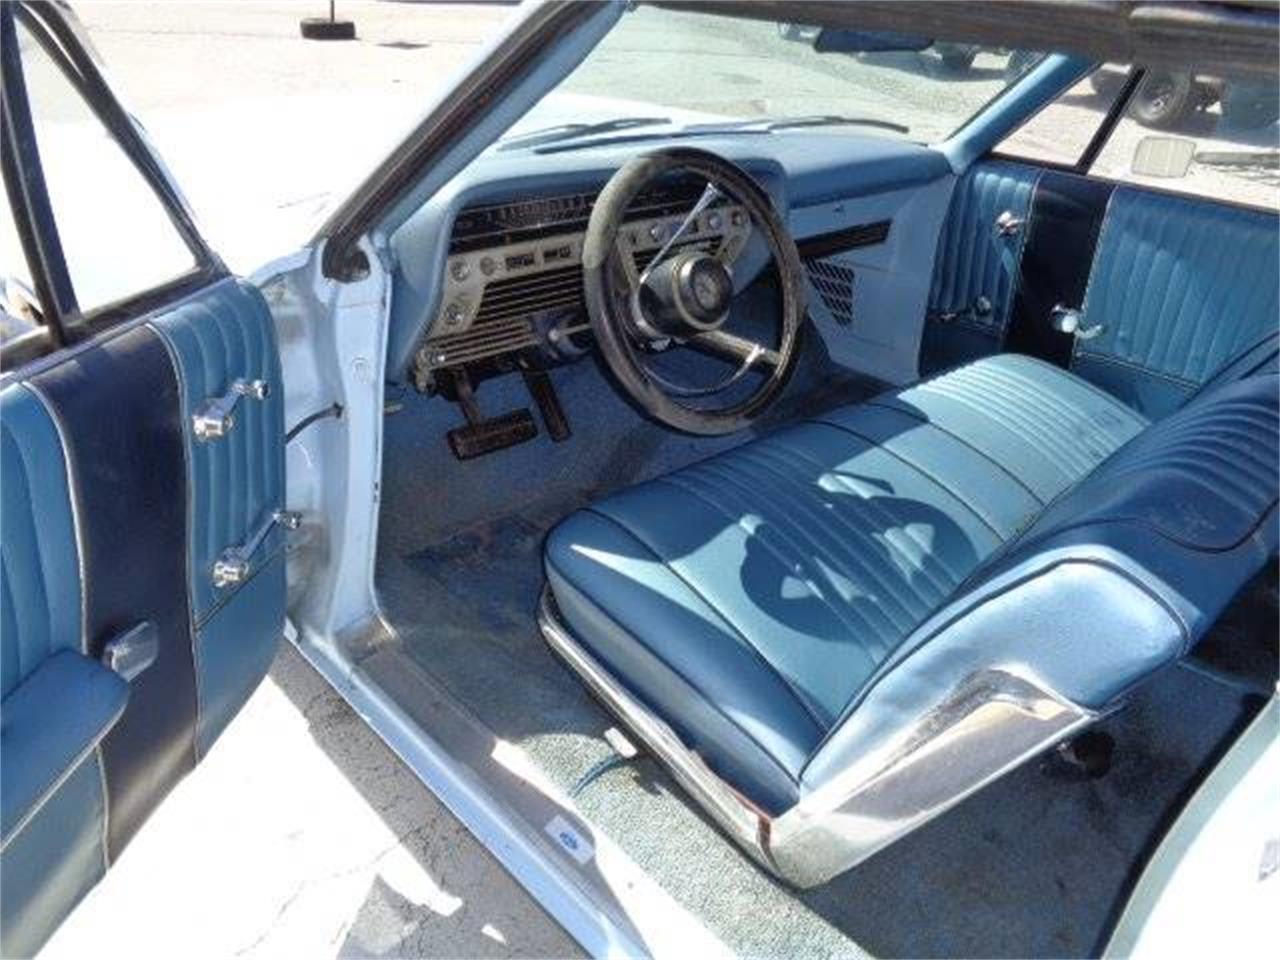 1967 Ford Galaxie 500 (CC-1084688) for sale in Staunton, Illinois